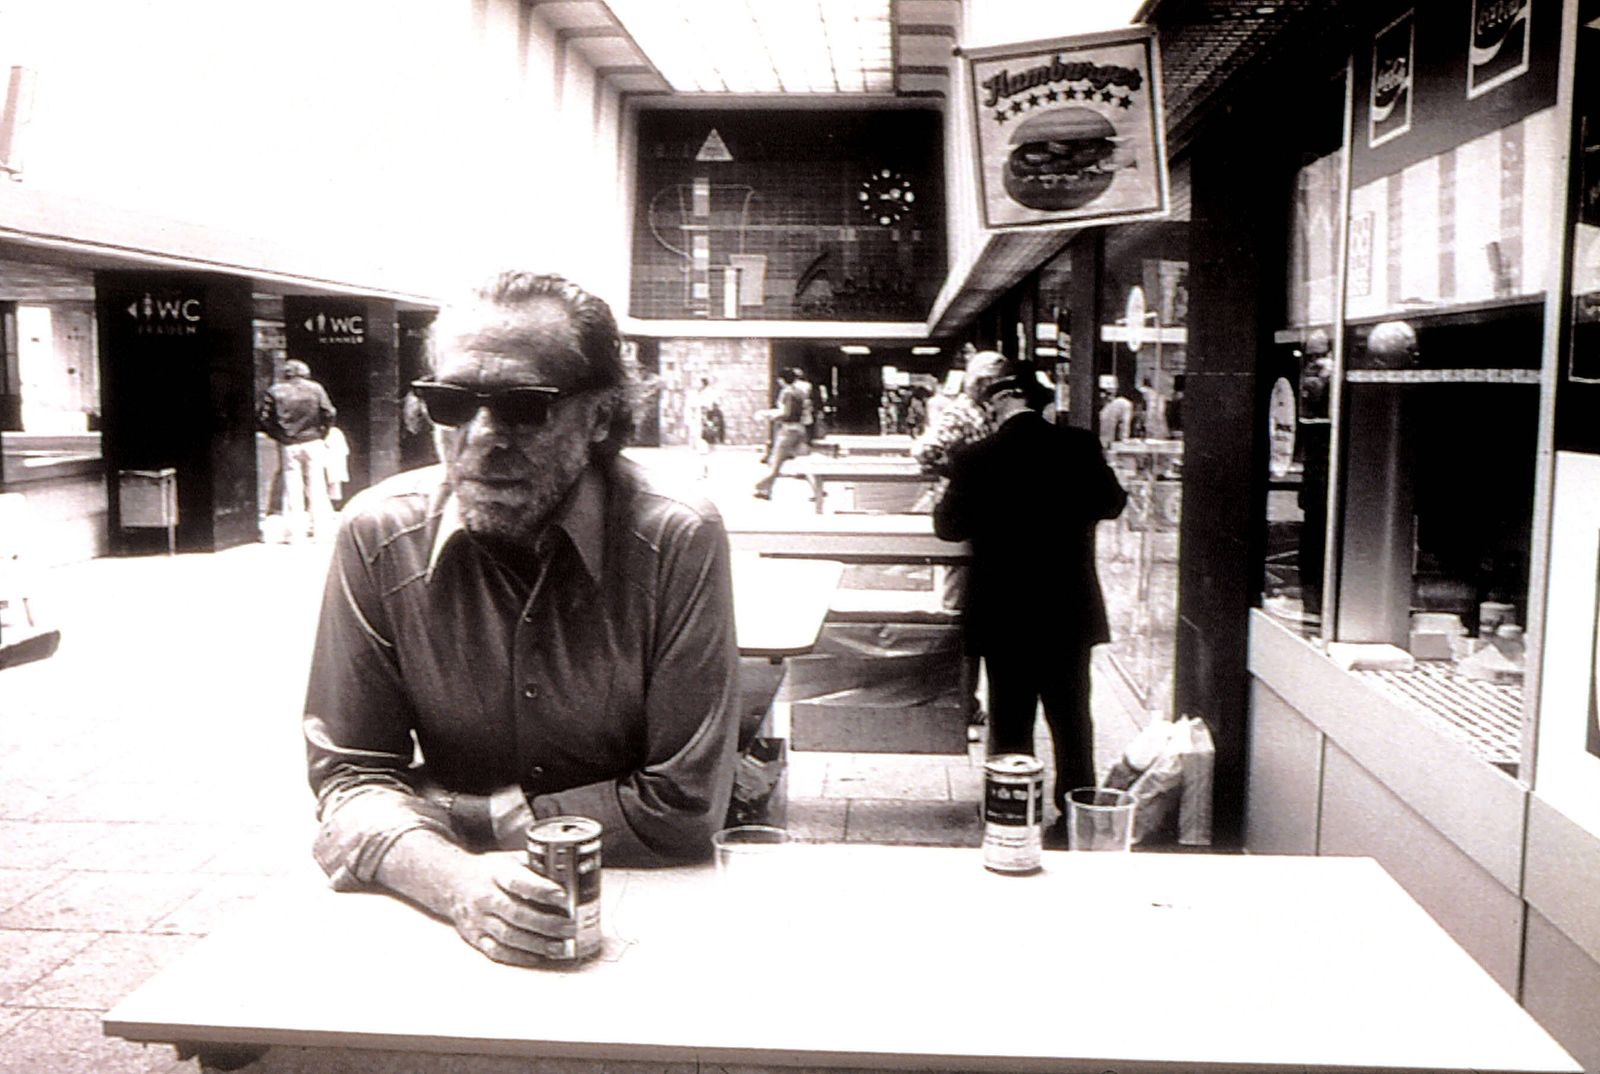 BUKOWSKI: BORN INTO THIS, Charles Bukowski, 2004, (c) Magnolia Pictures/courtesy Everett Collection Magnolia Pictures/C